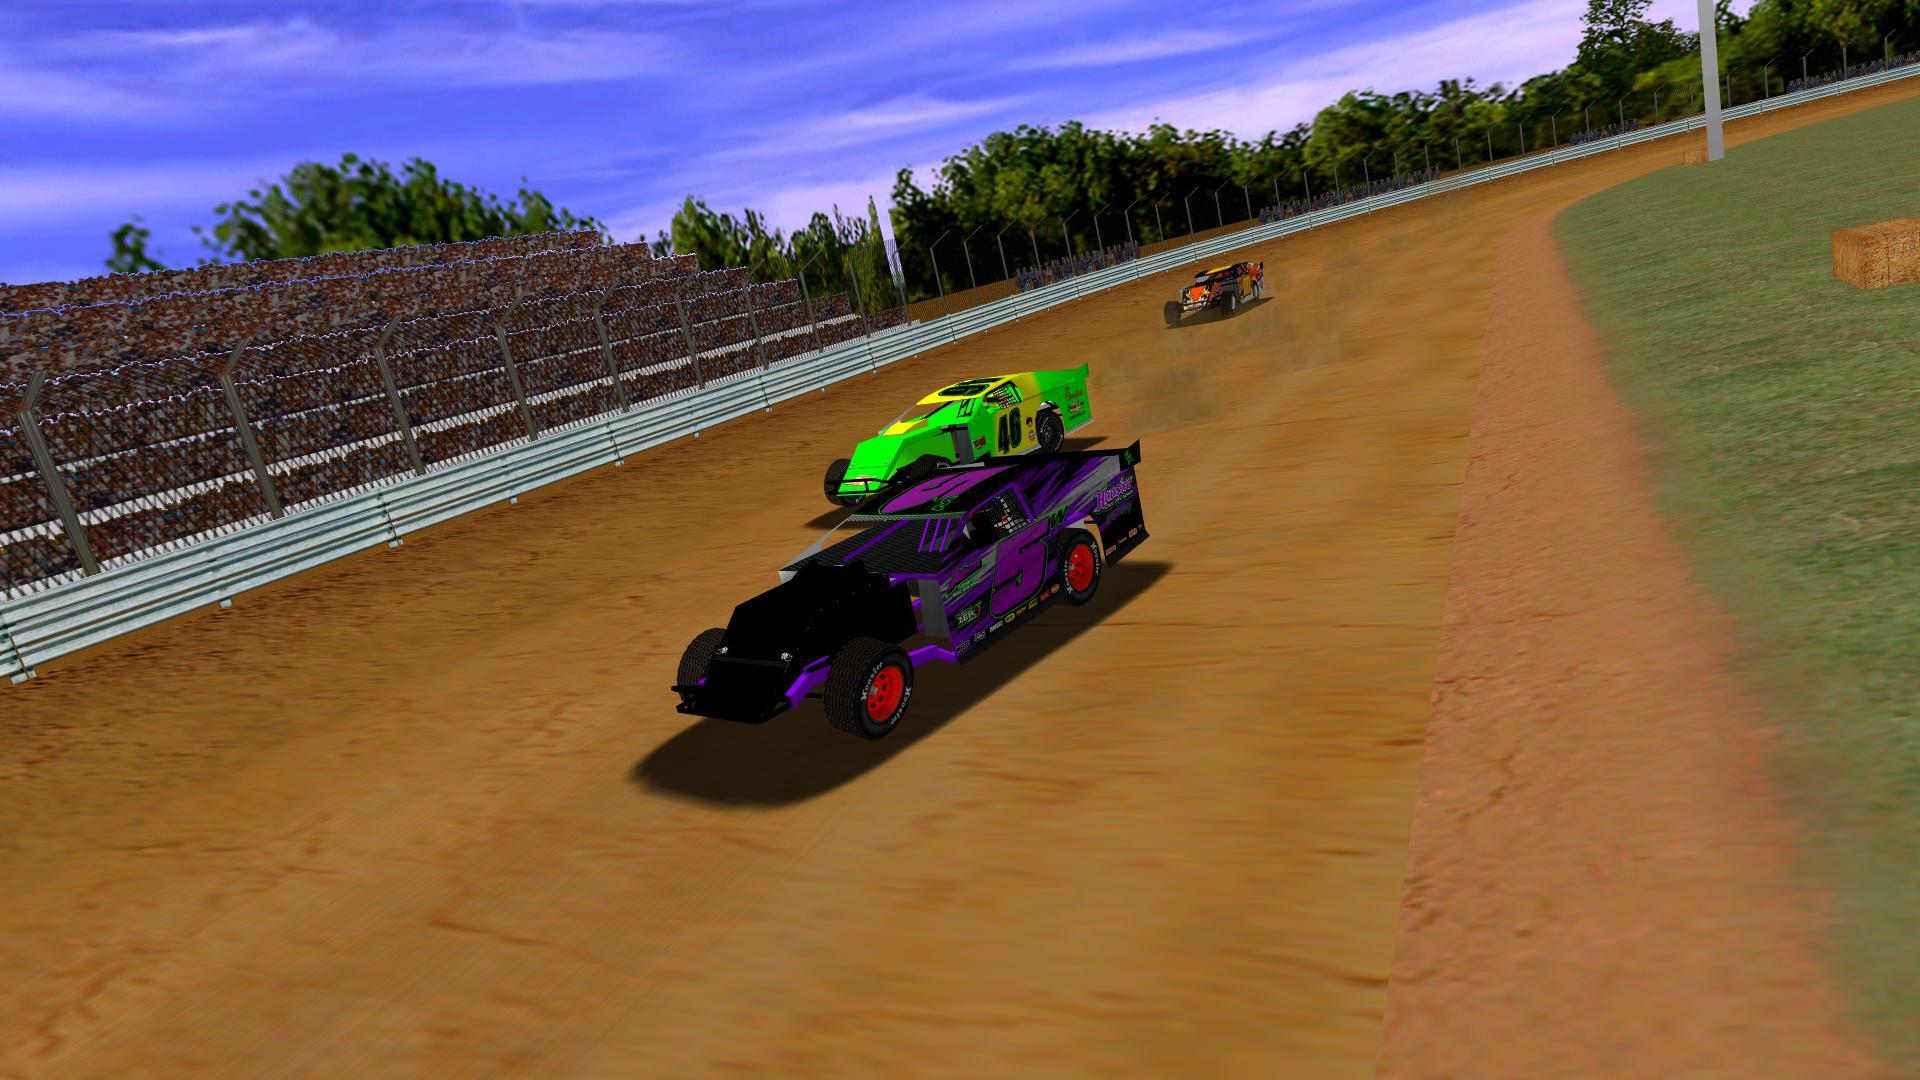 Donaldson leading puttzracer and KartRacer63 to the flag at Finish Line. (Credit: KartRacer63)